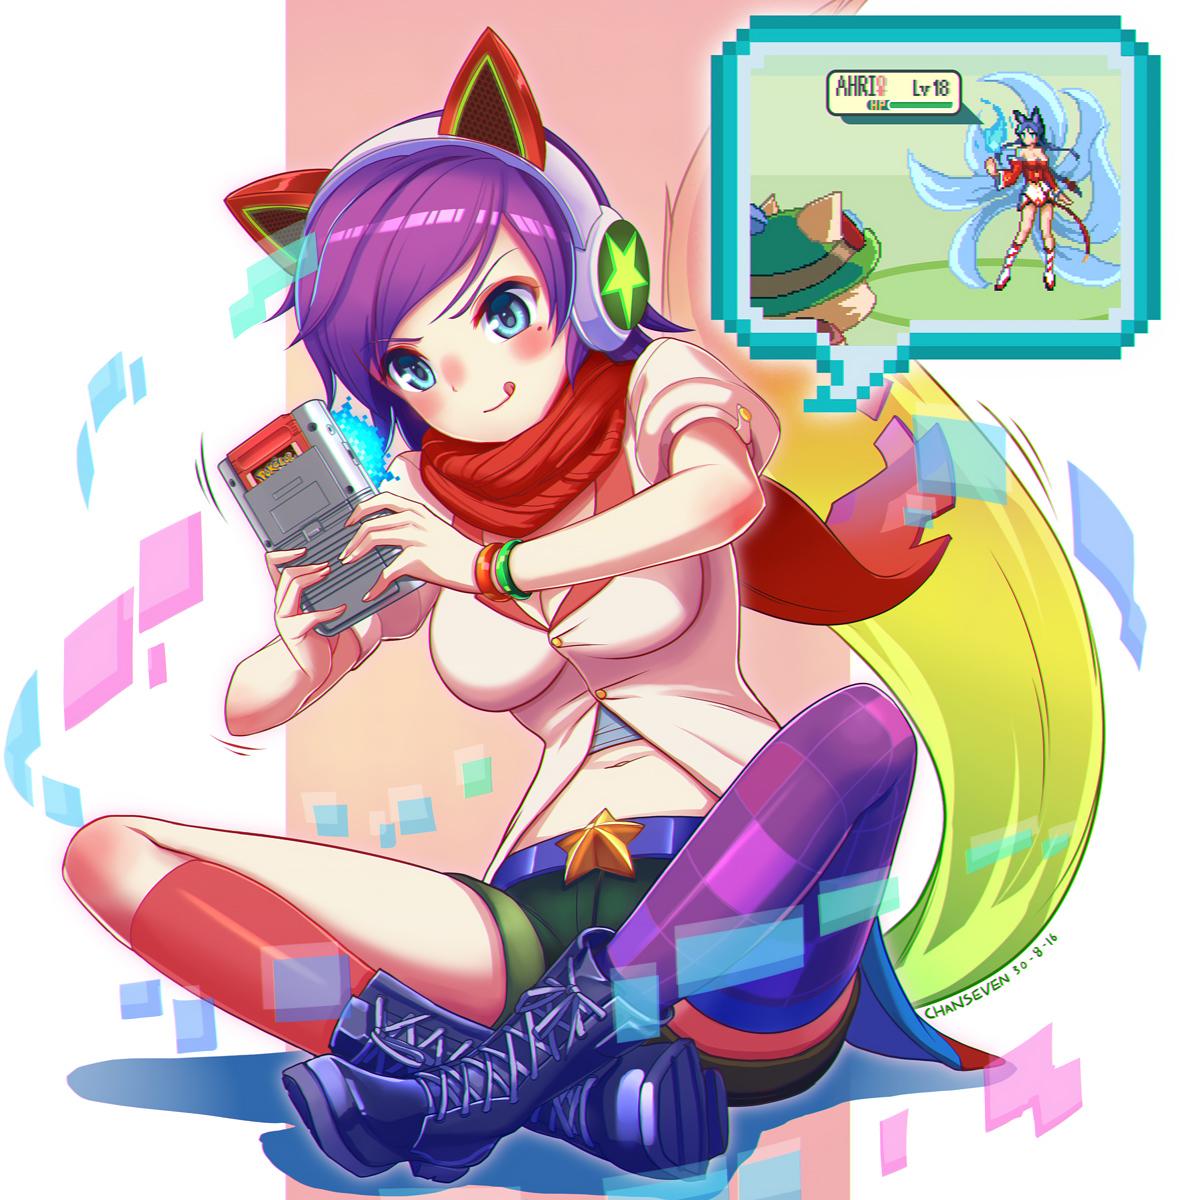 Ahri R34 ahri | firstplayer wiki | fandom